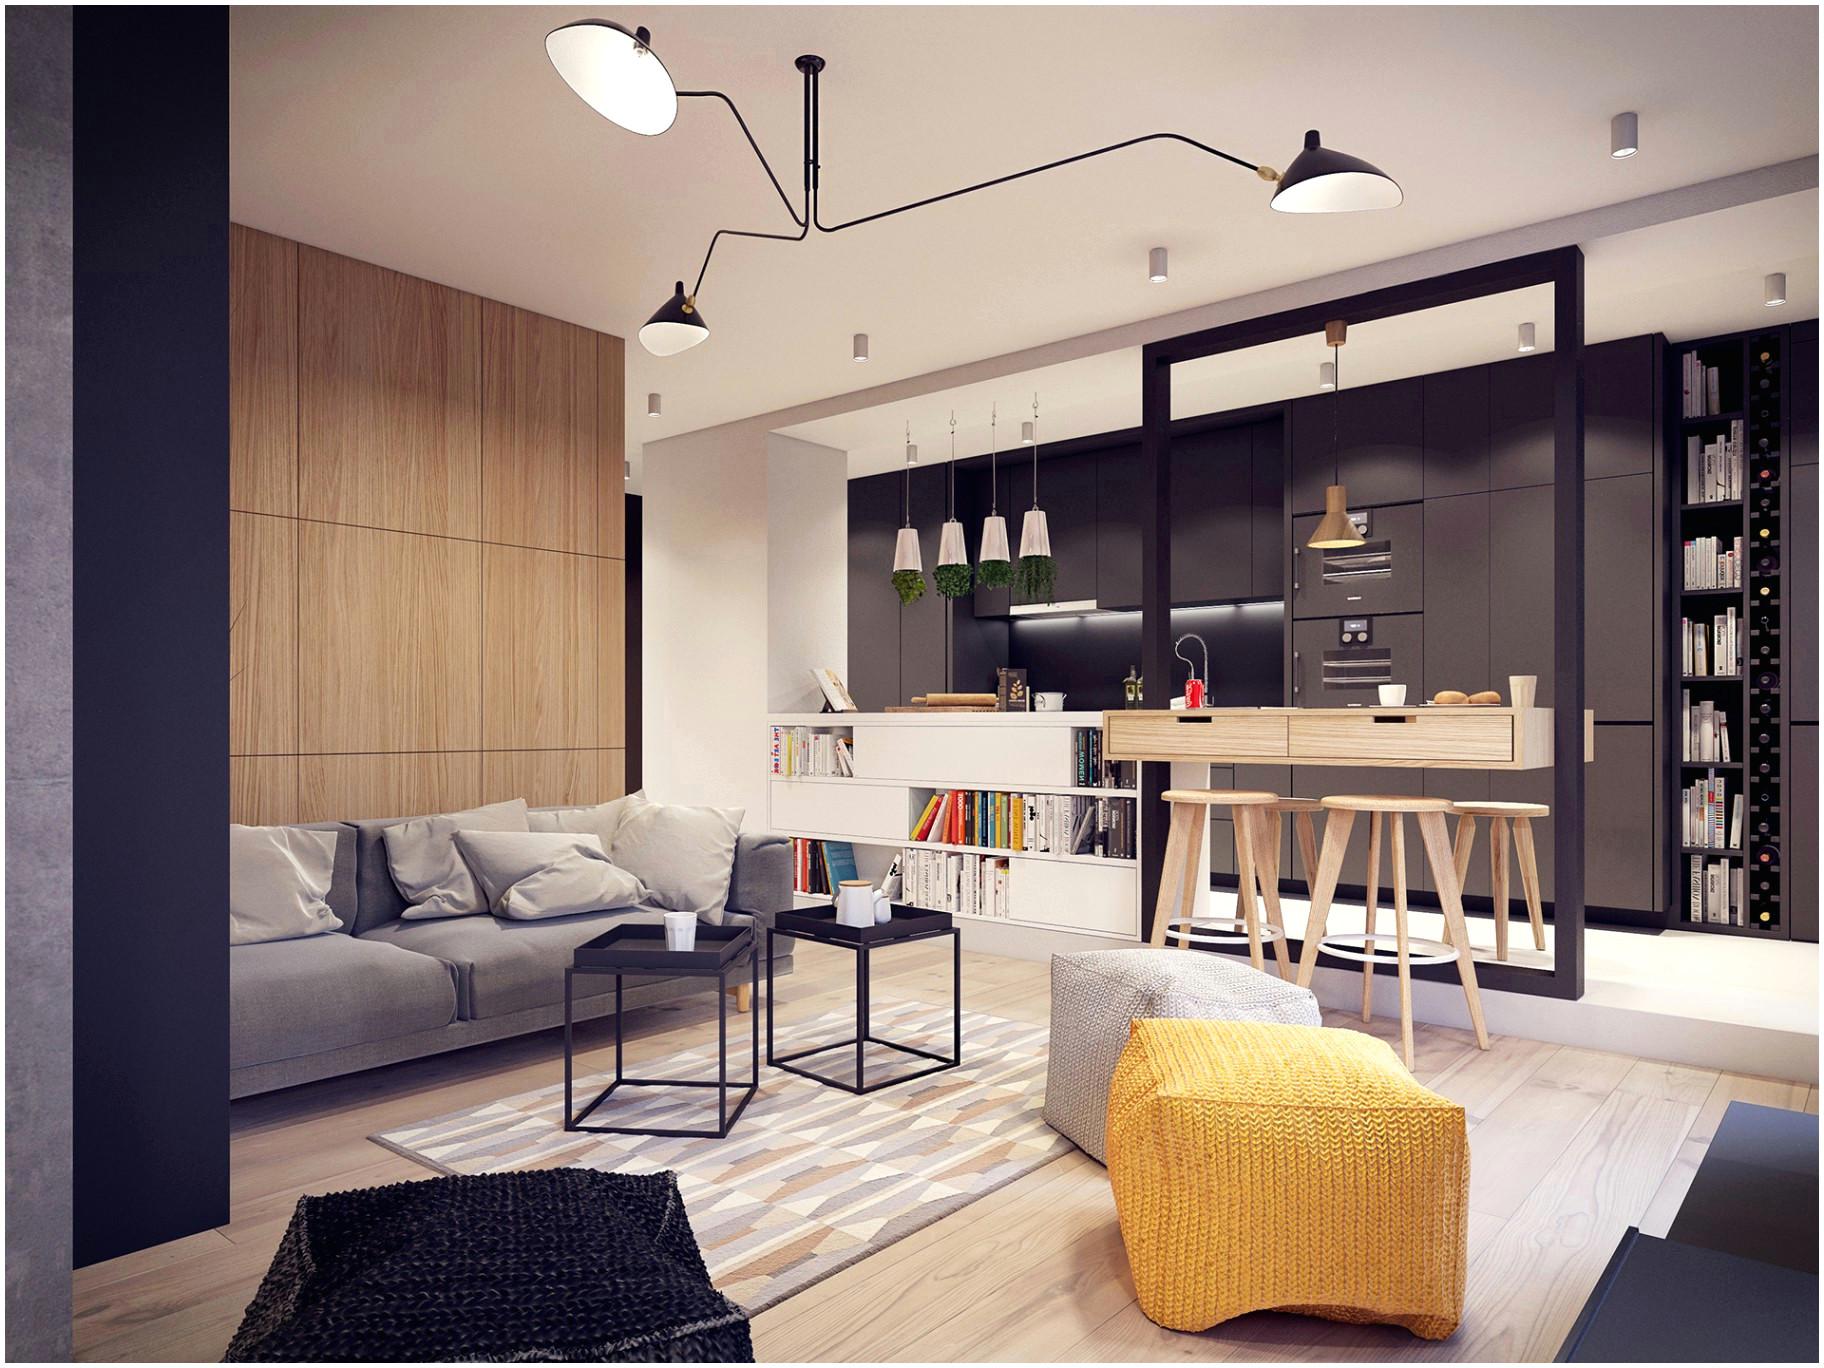 cuisine moderne 2016 meilleur de moderne wohnzimmer ideen schon bar wohnzimmer